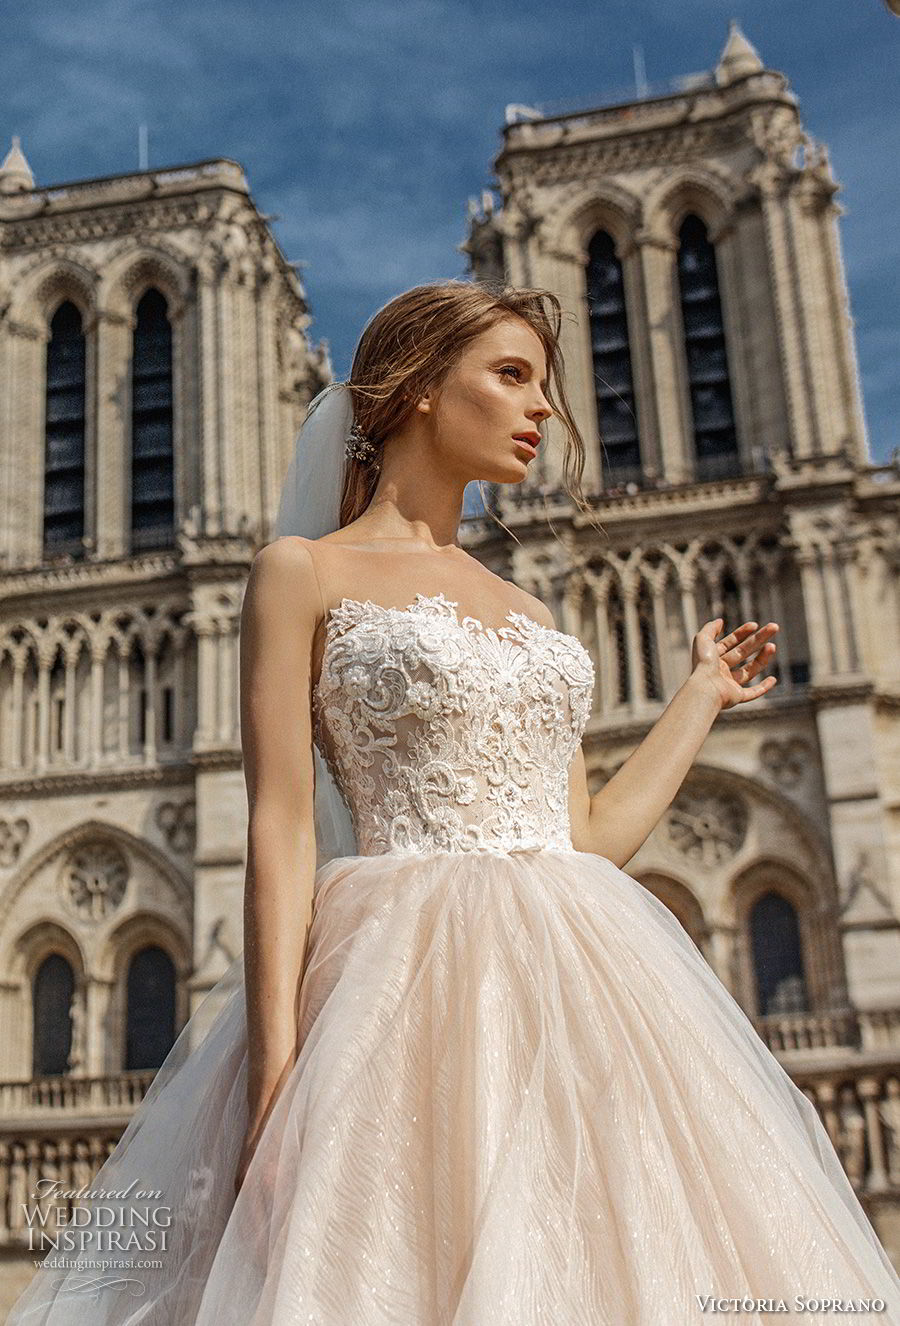 victoria soprano 2019 bridal sleeveless illusion bateau sweetheart neckline princess blush ball gown wedding dress chapel train (15) zv